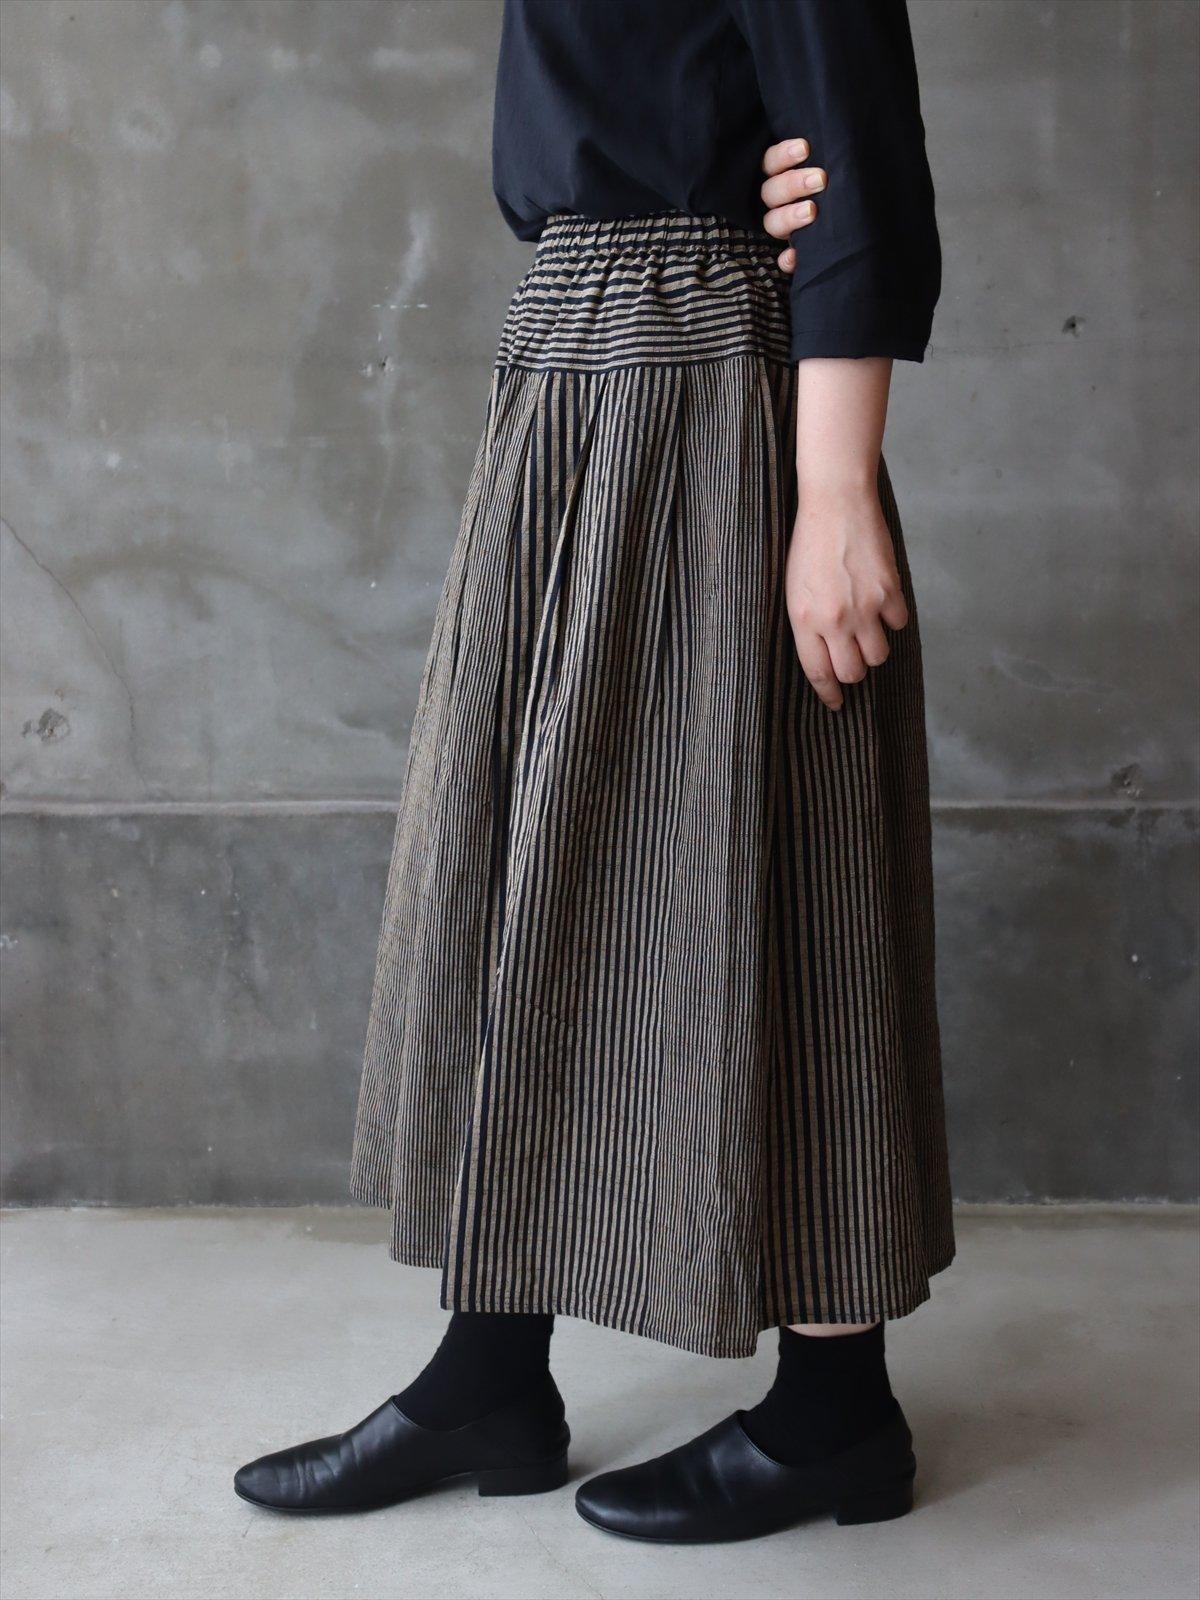 YAMMA 会津木綿タックスカート ぼかし縞(紺)